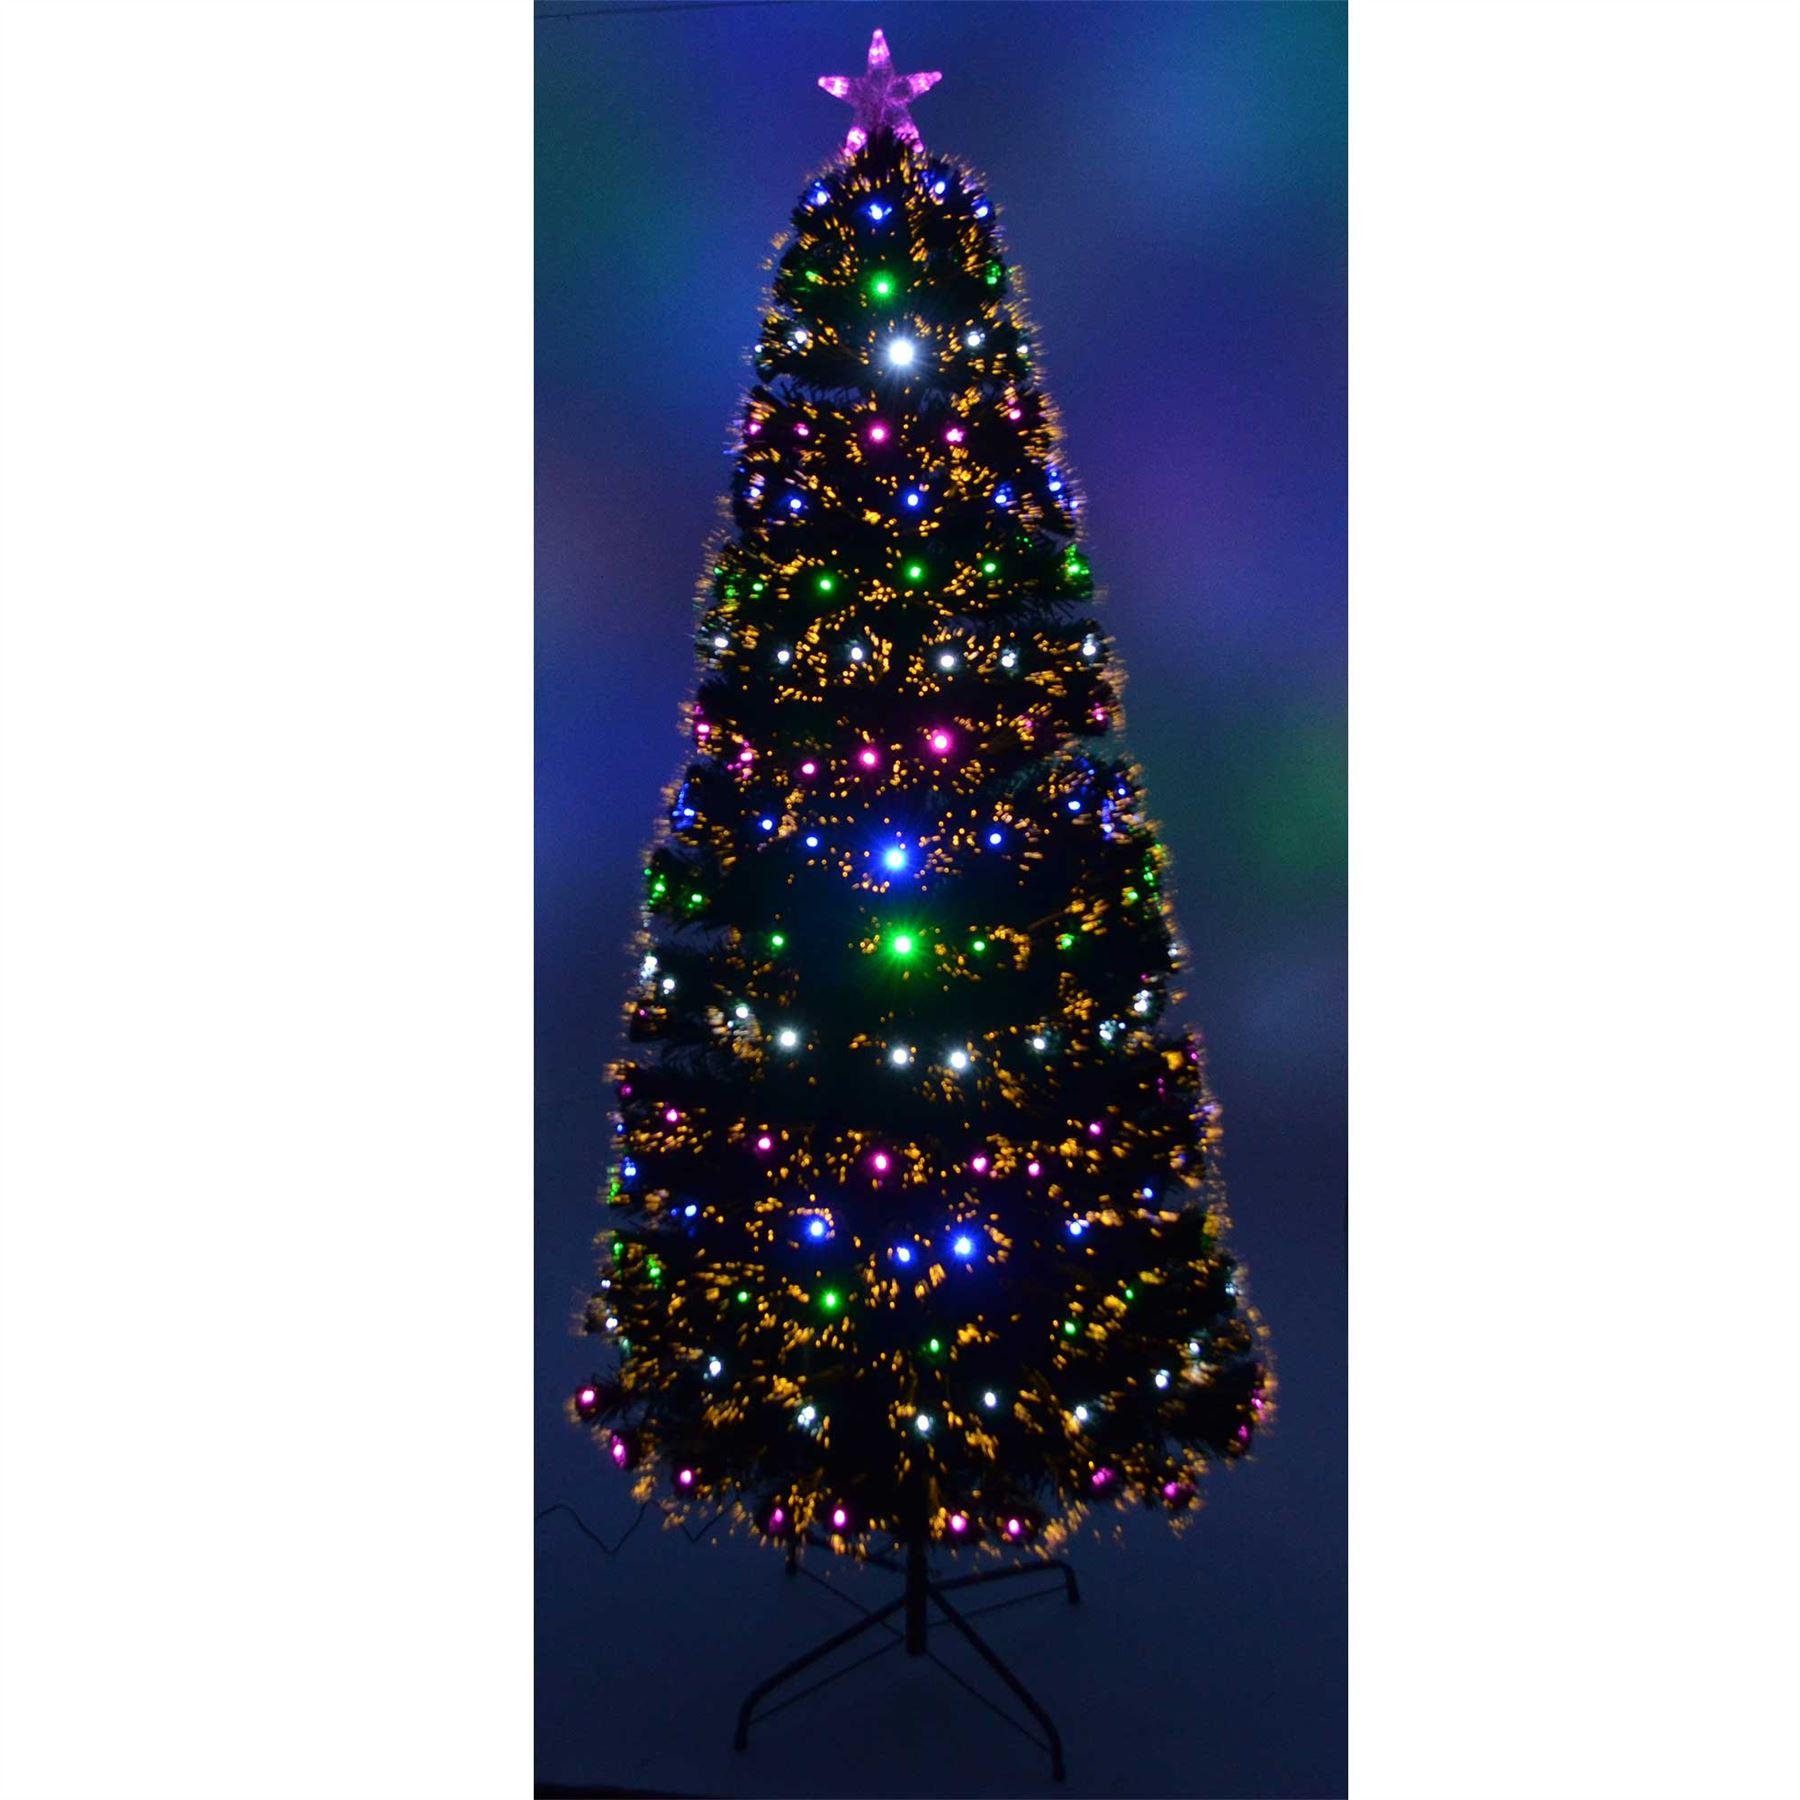 7ft Led Fibre Optic Christmas Tree Remote Controlled Pre Lit Xmas Home Decor